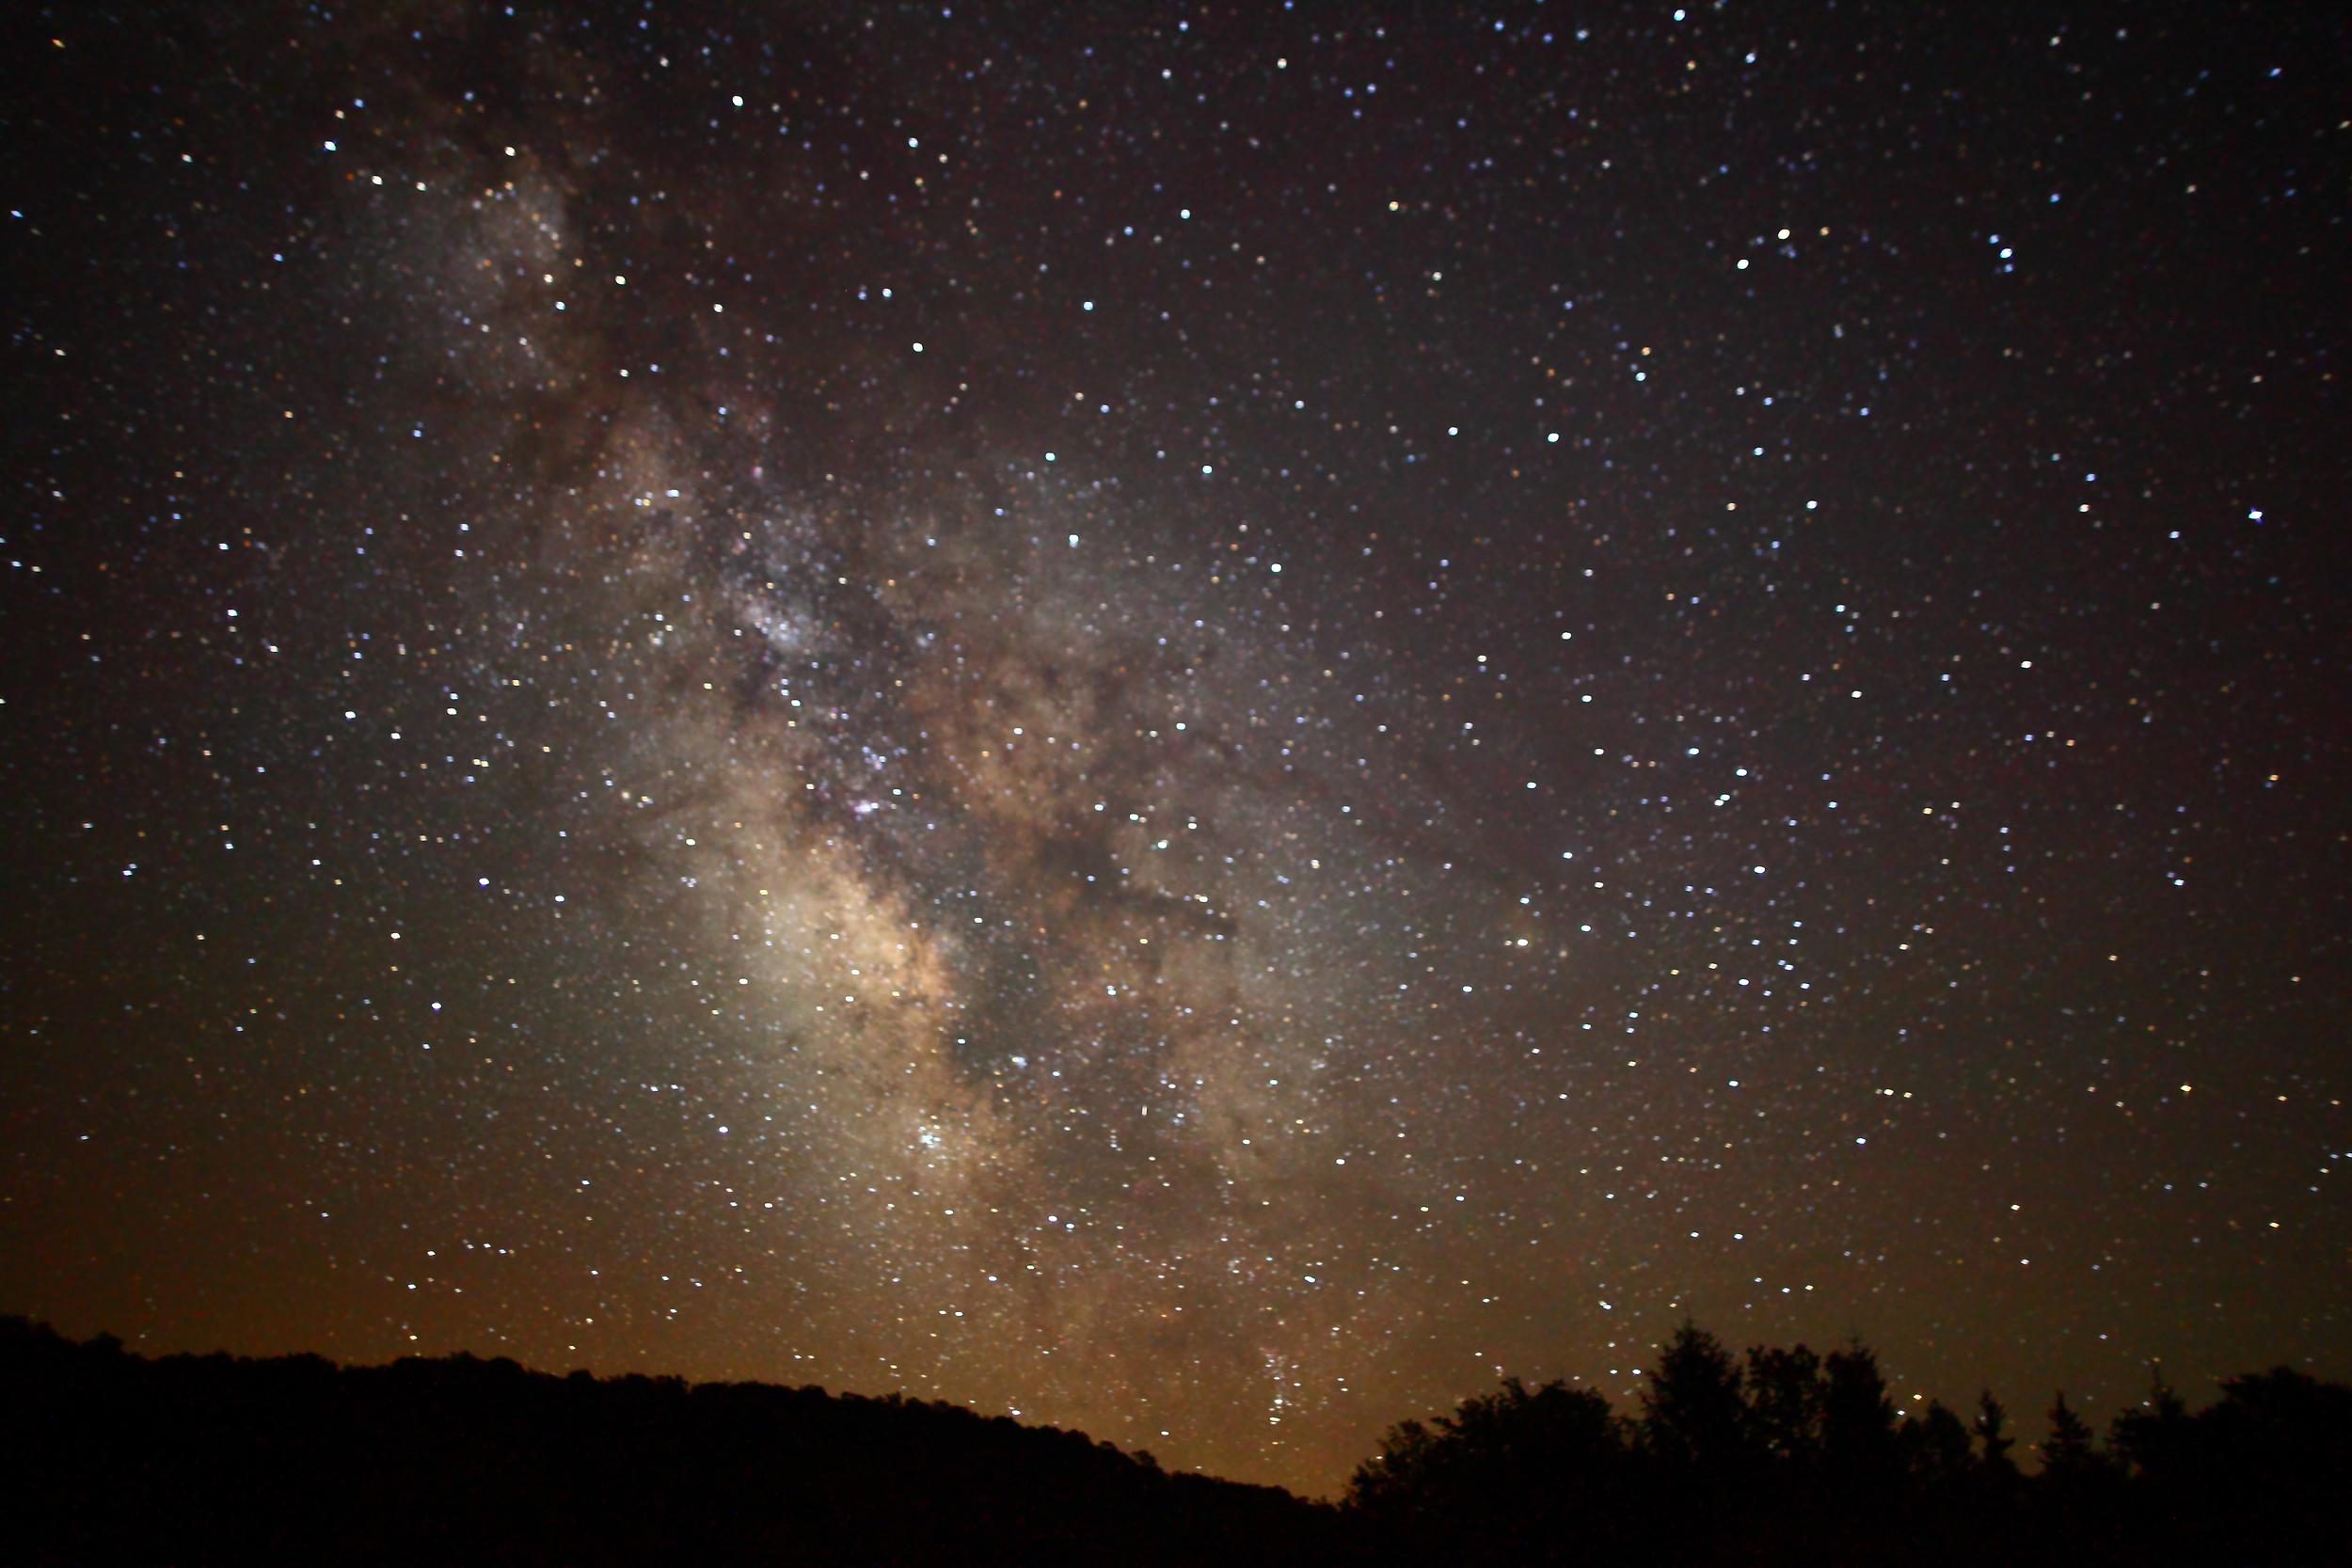 galaxy milky way engagement - photo #42